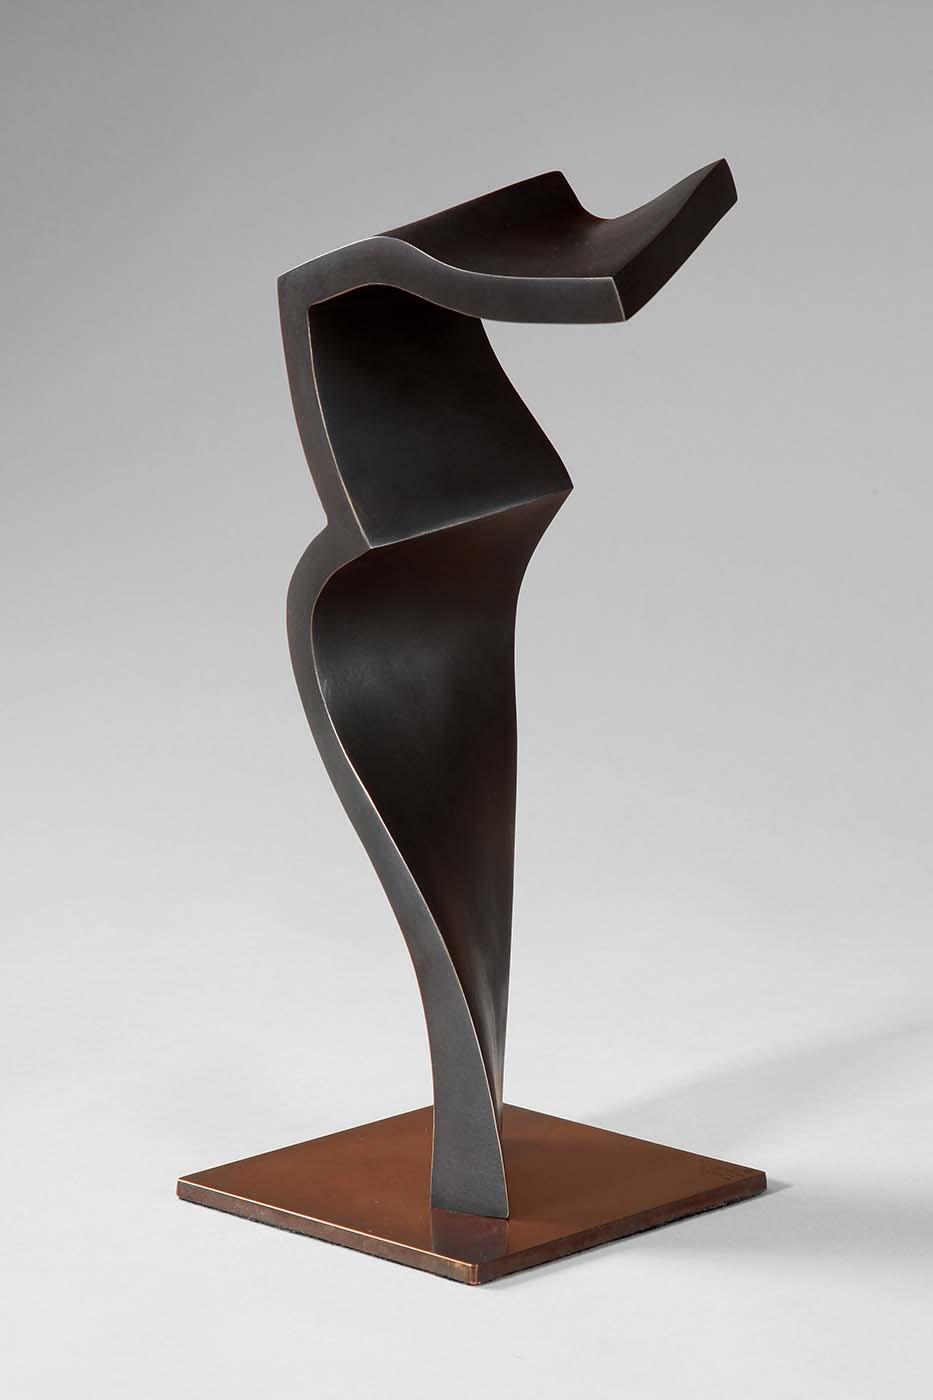 Pianist, 2012, Bronze, 30 x 14 x 12 cm (02)